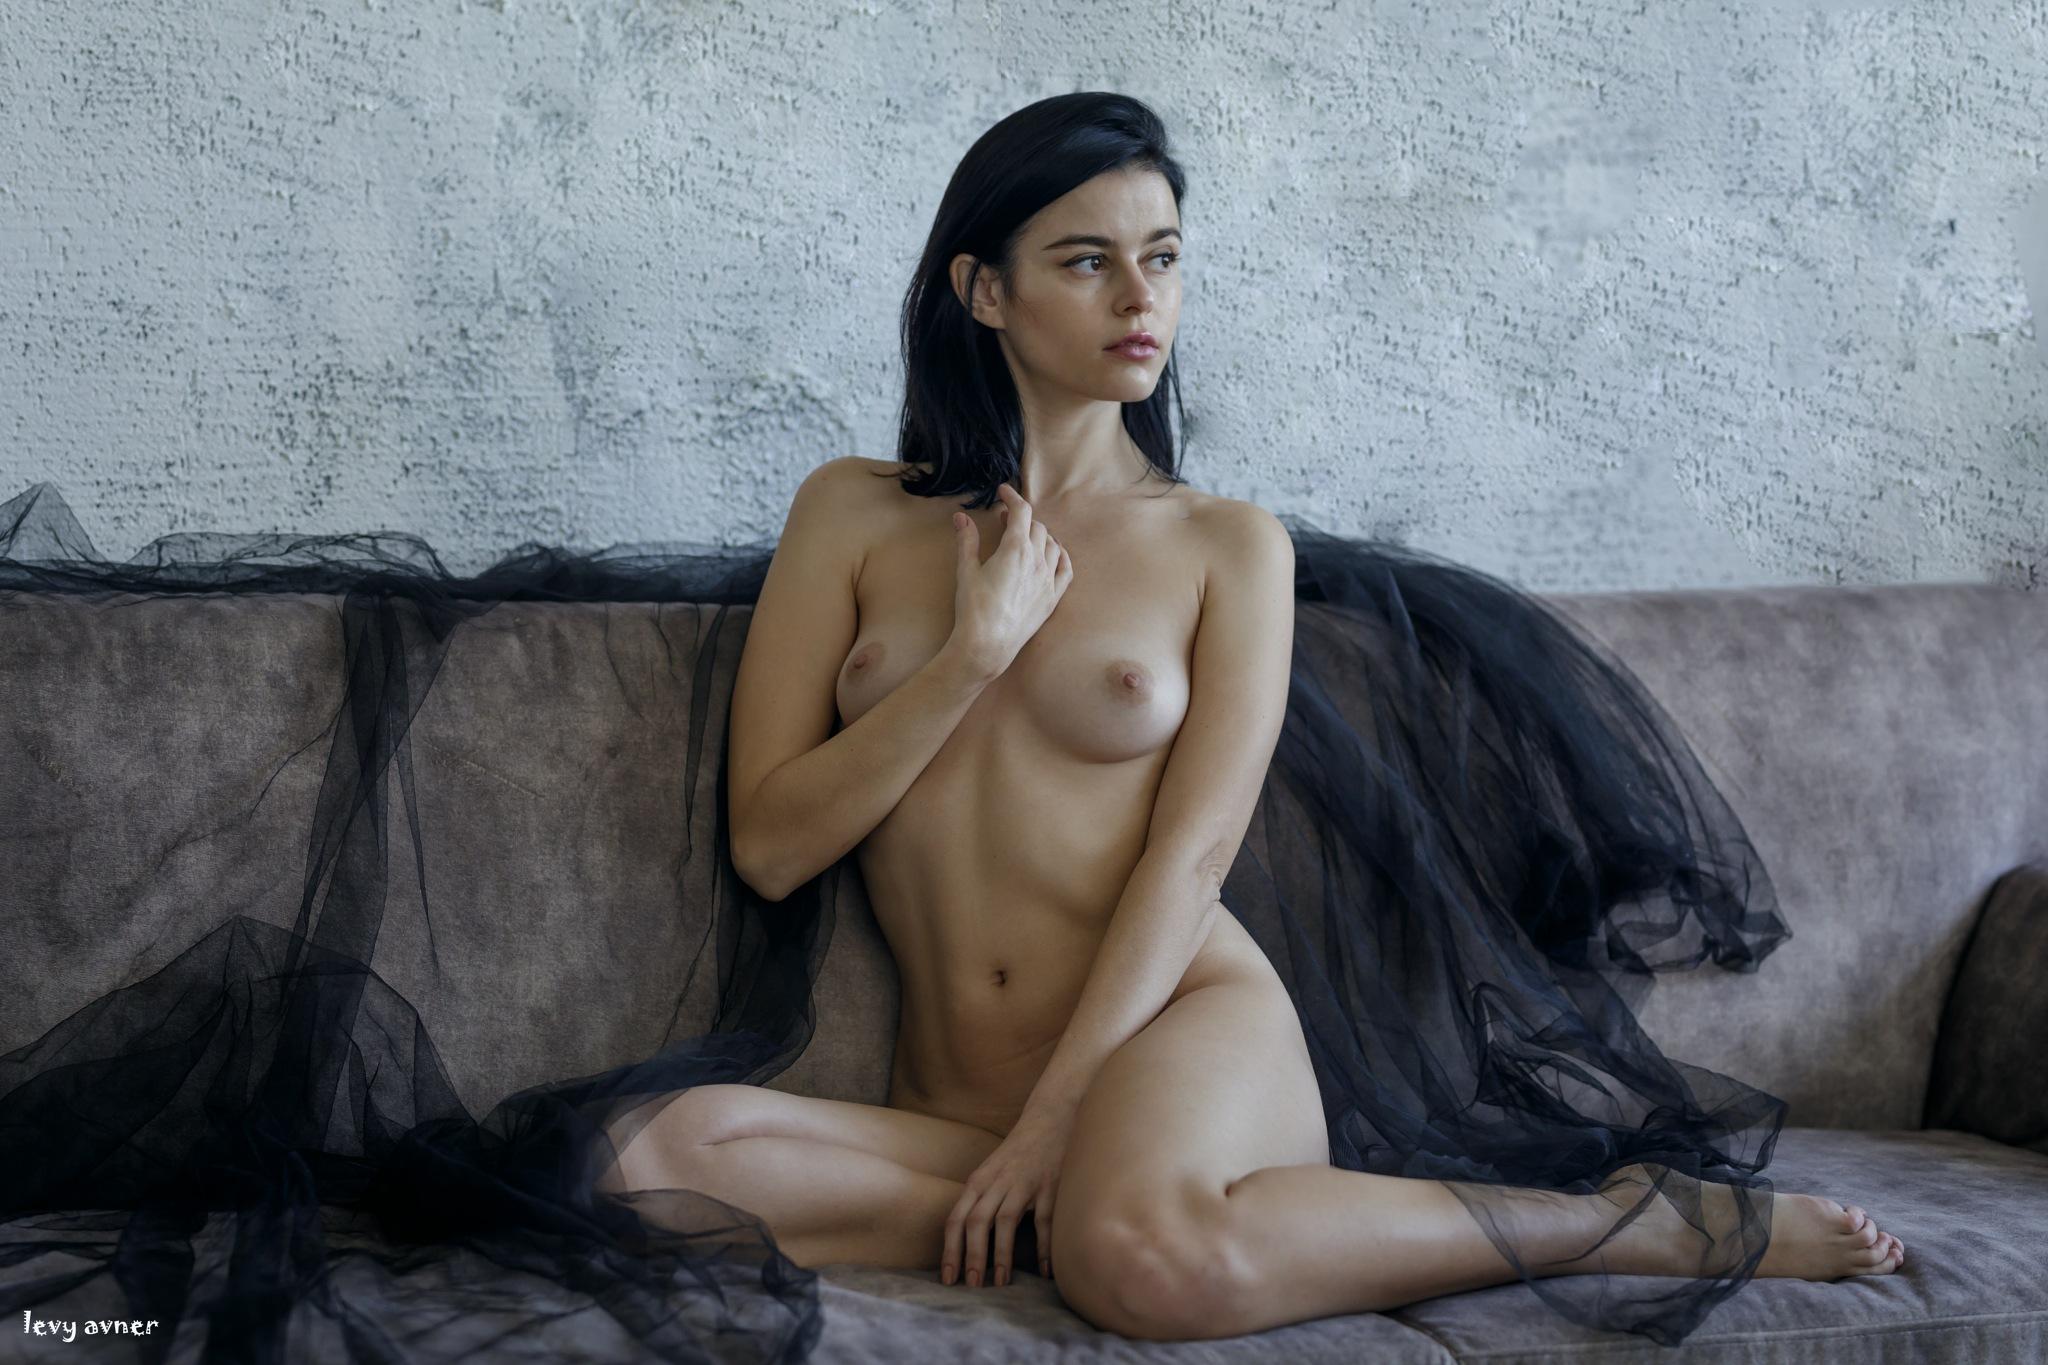 Polina by levy avner